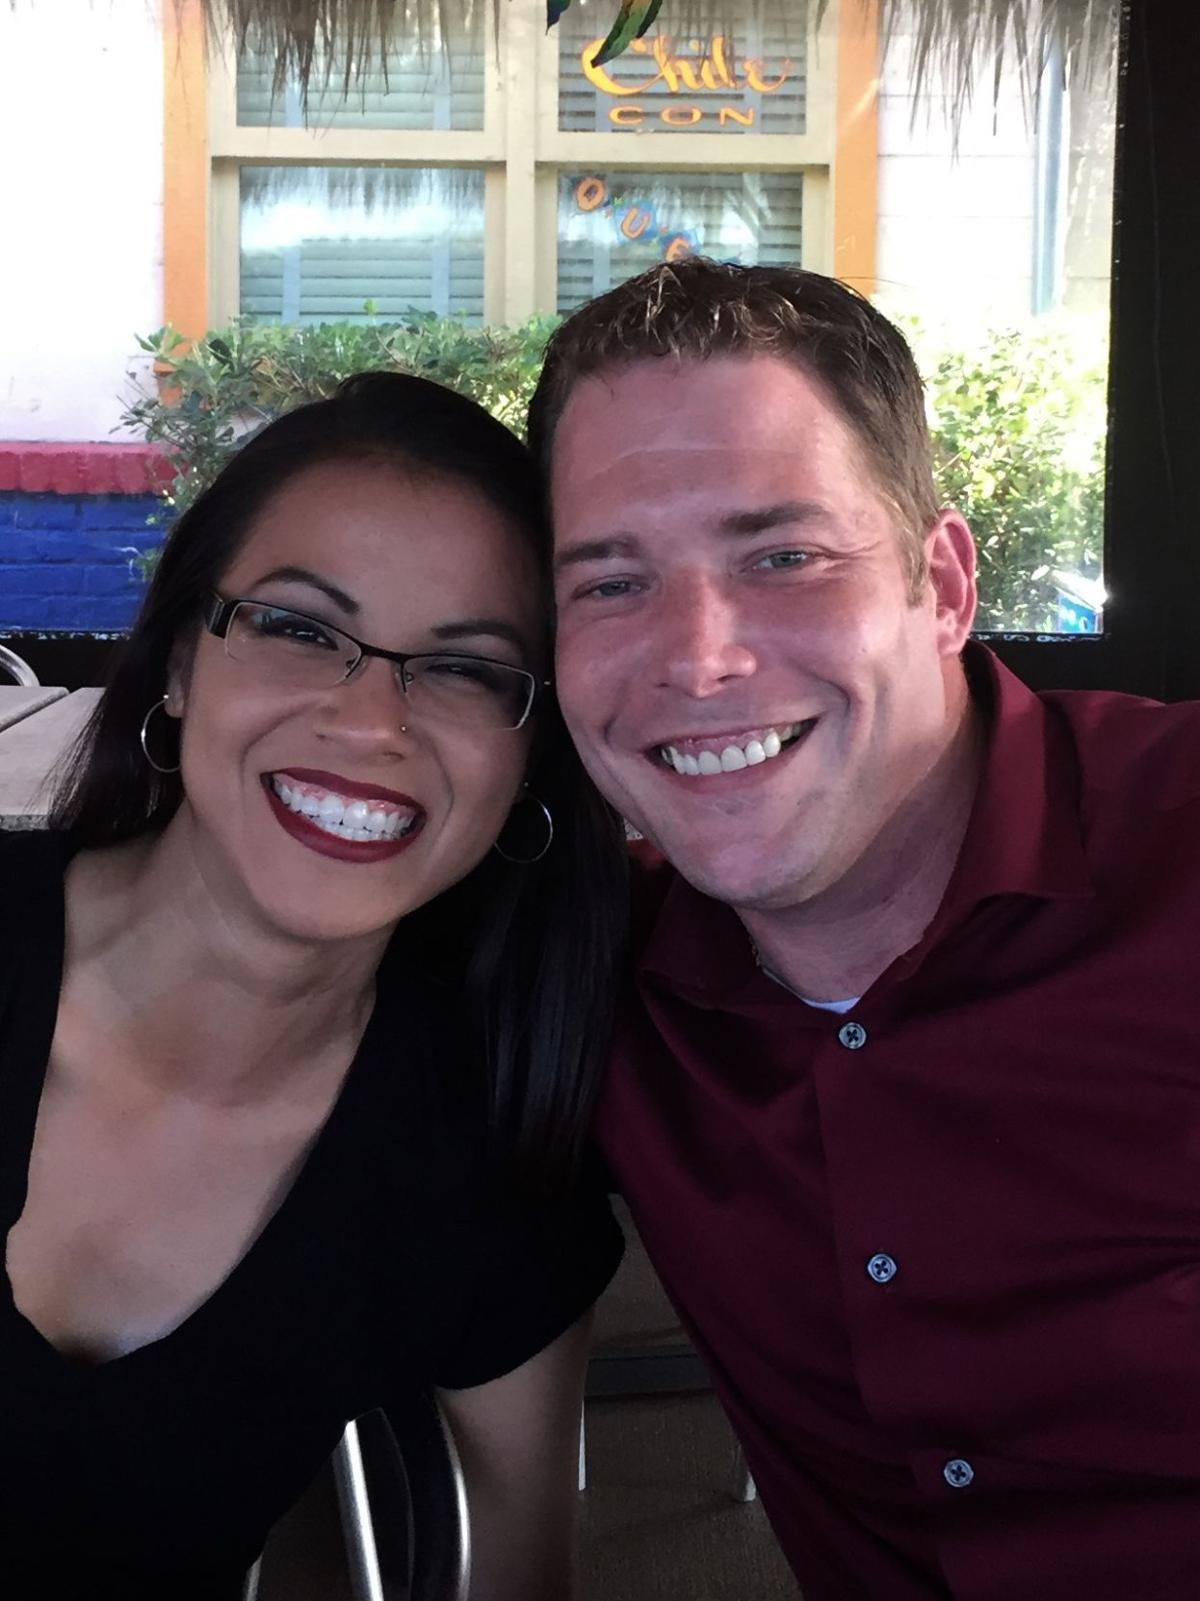 John Comstock and Michelle Munguia